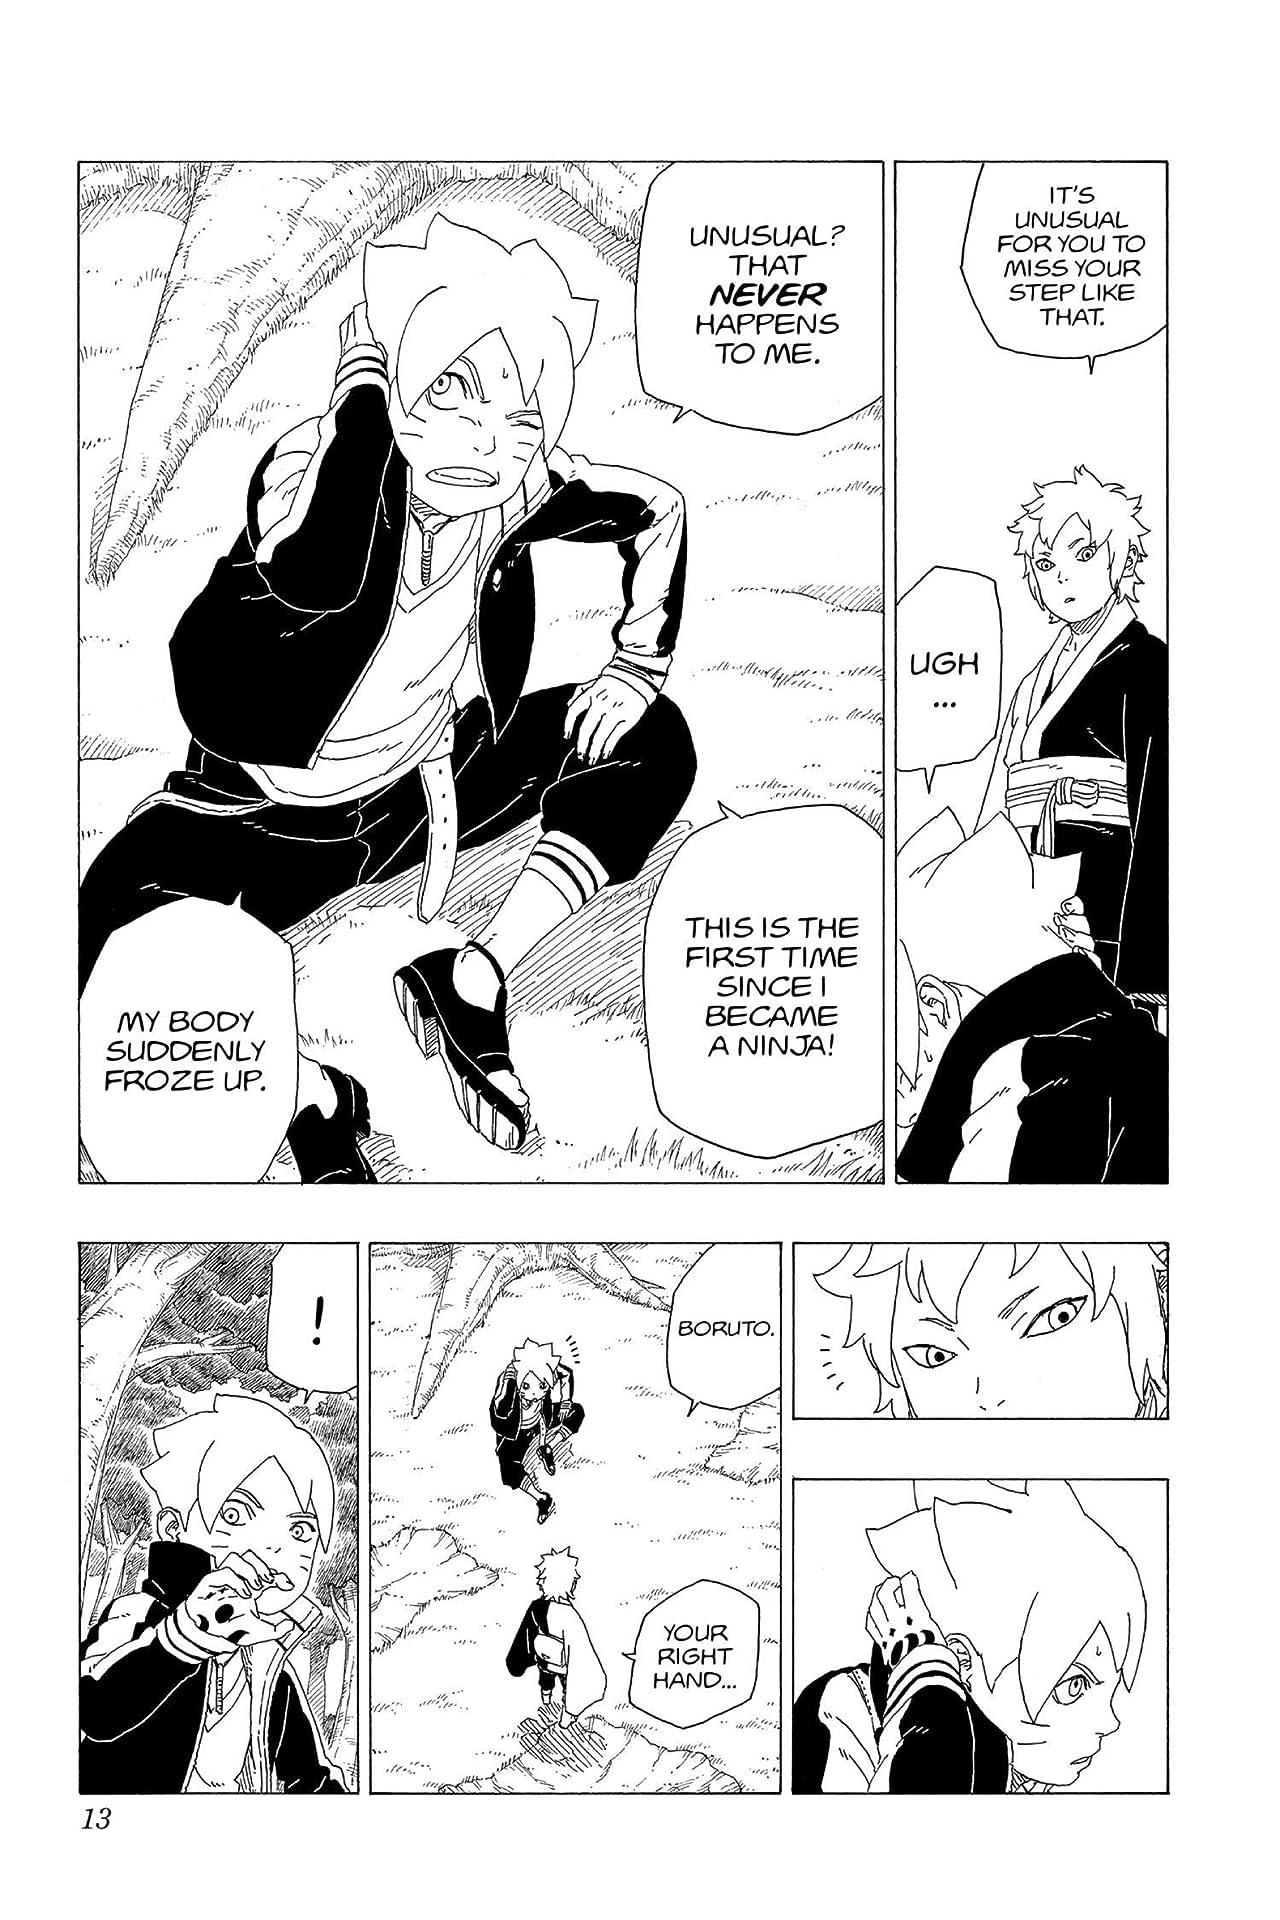 Boruto: Naruto Next Generations Vol. 10: He's Bad News